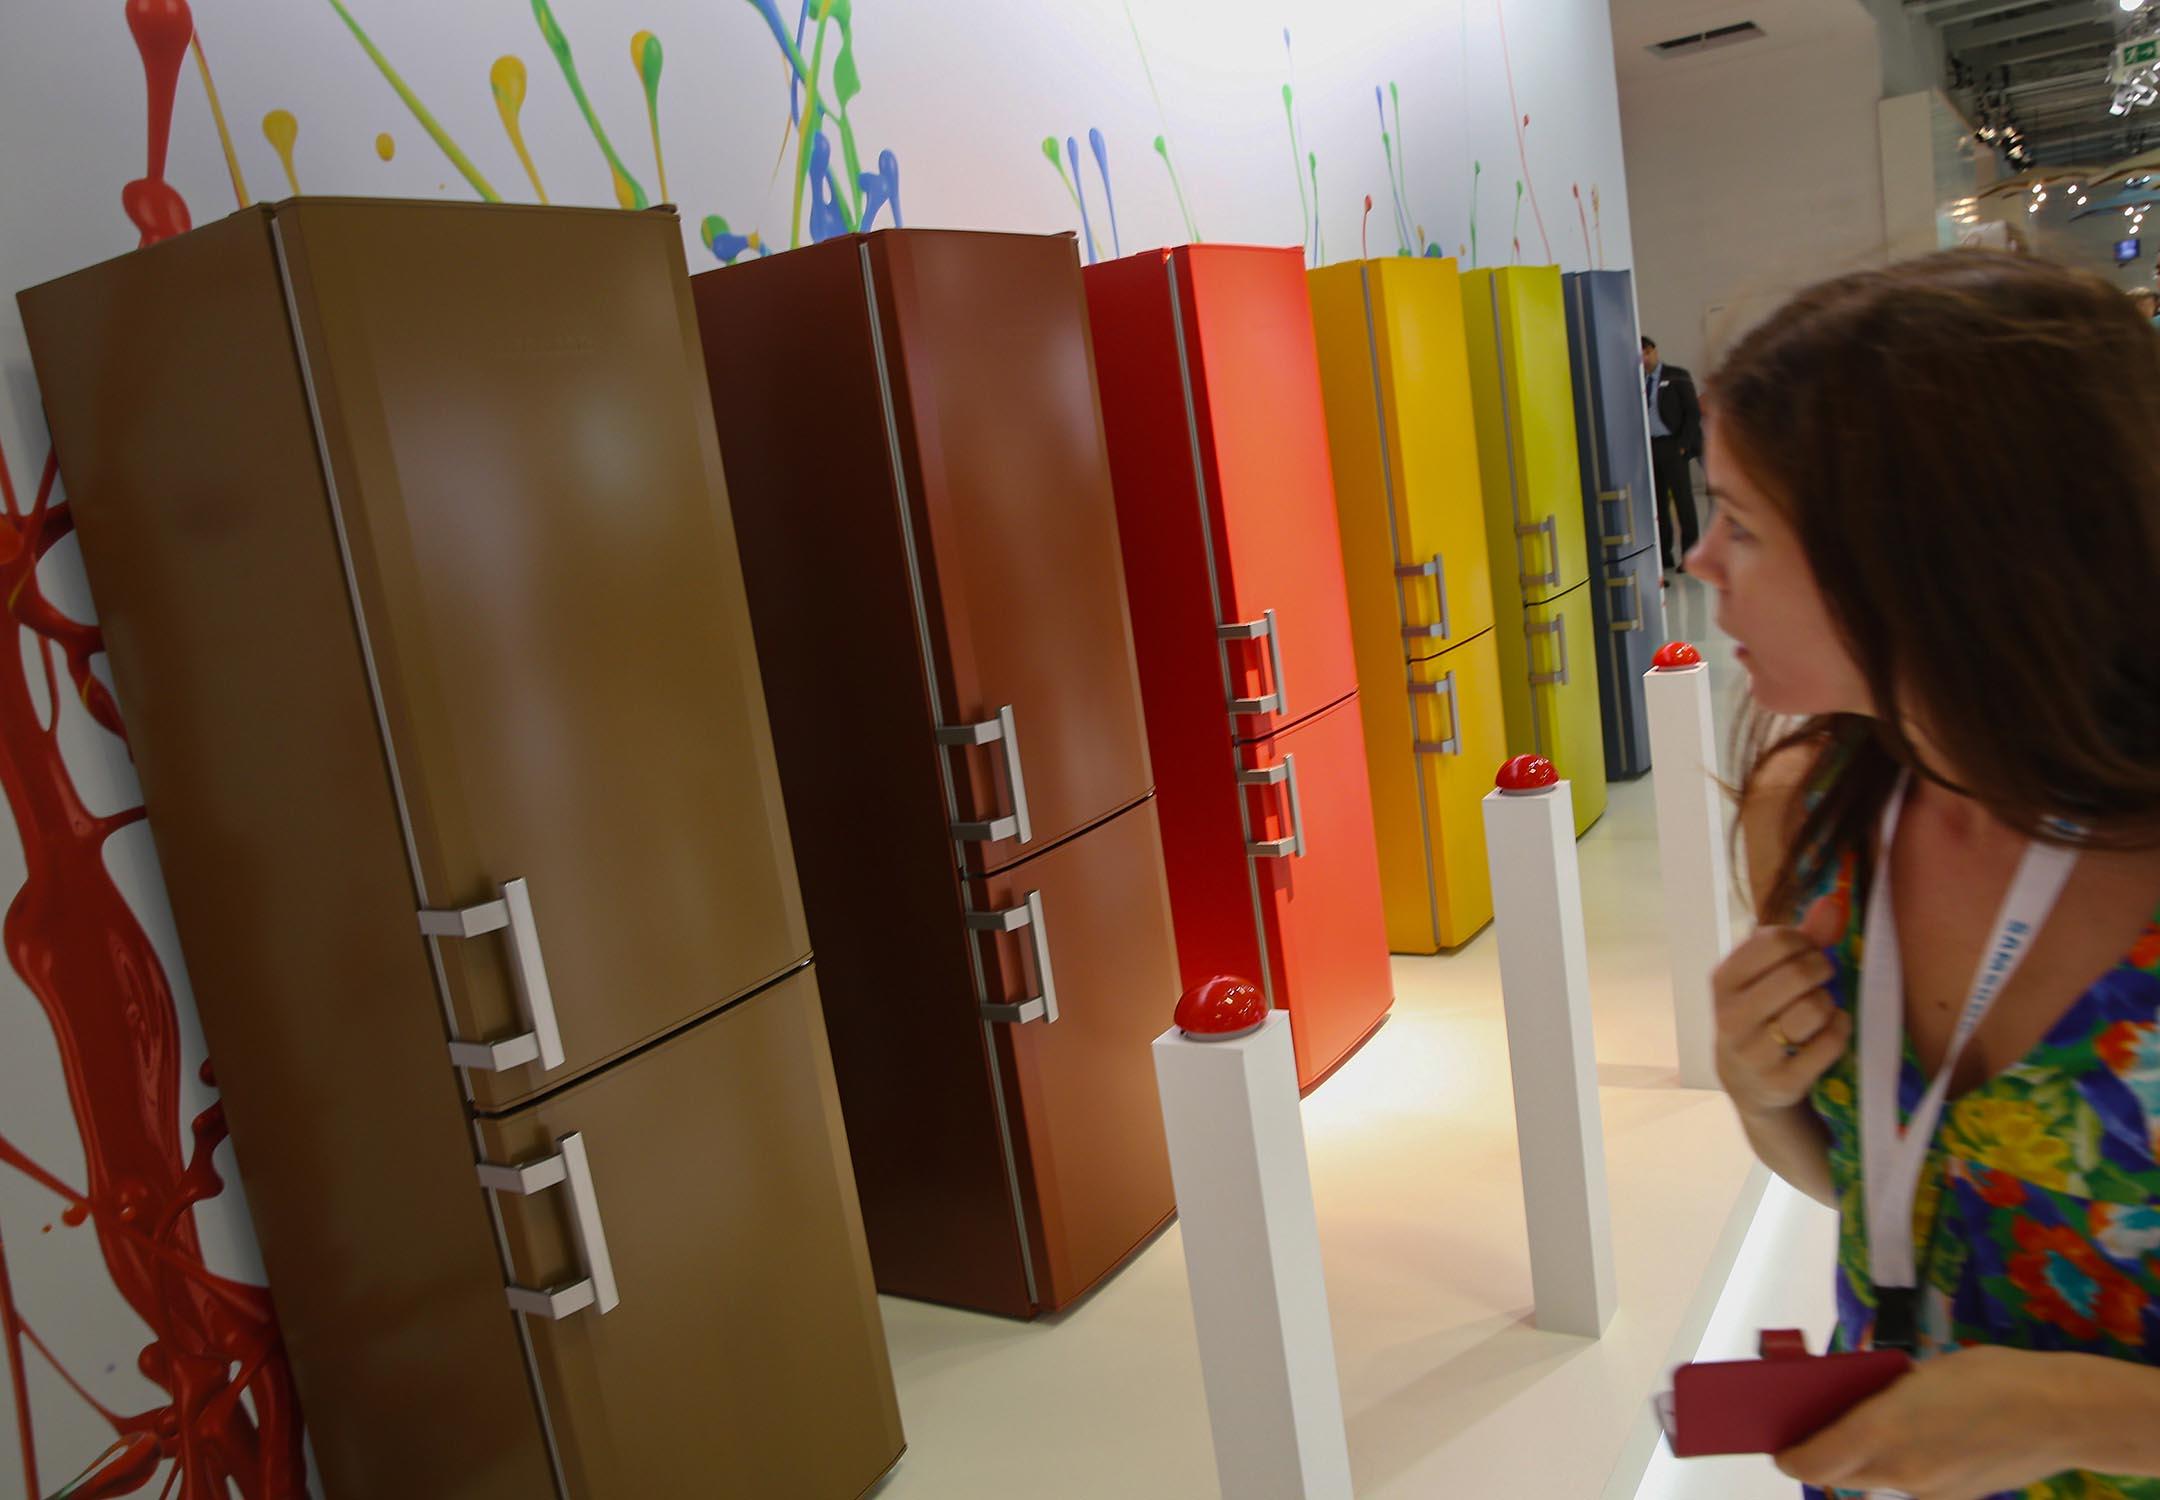 2014年9月5日柏林,一列冰箱在家電展上。 攝:Sean Gallup/Getty Images